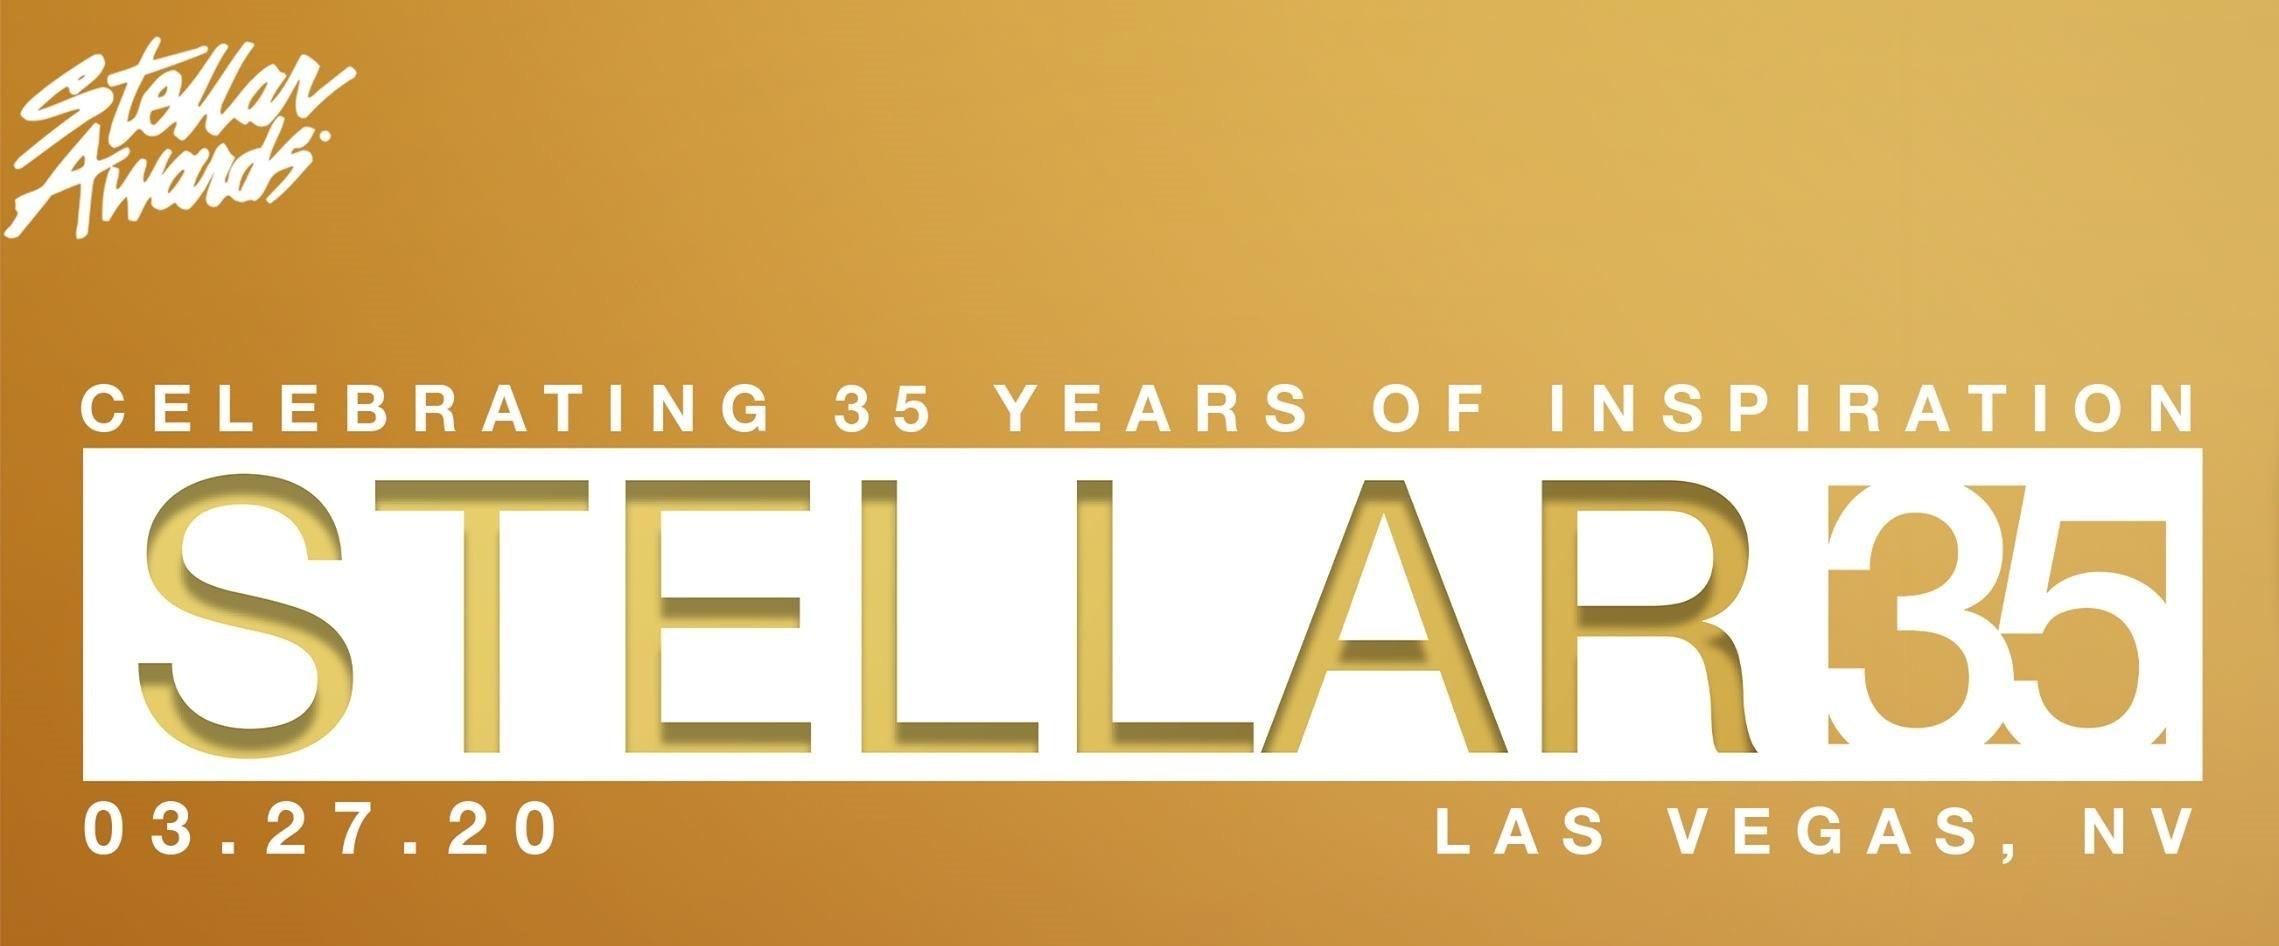 Stellar awards las vegas 2021 presidential betting top 10 betting sites csgofast